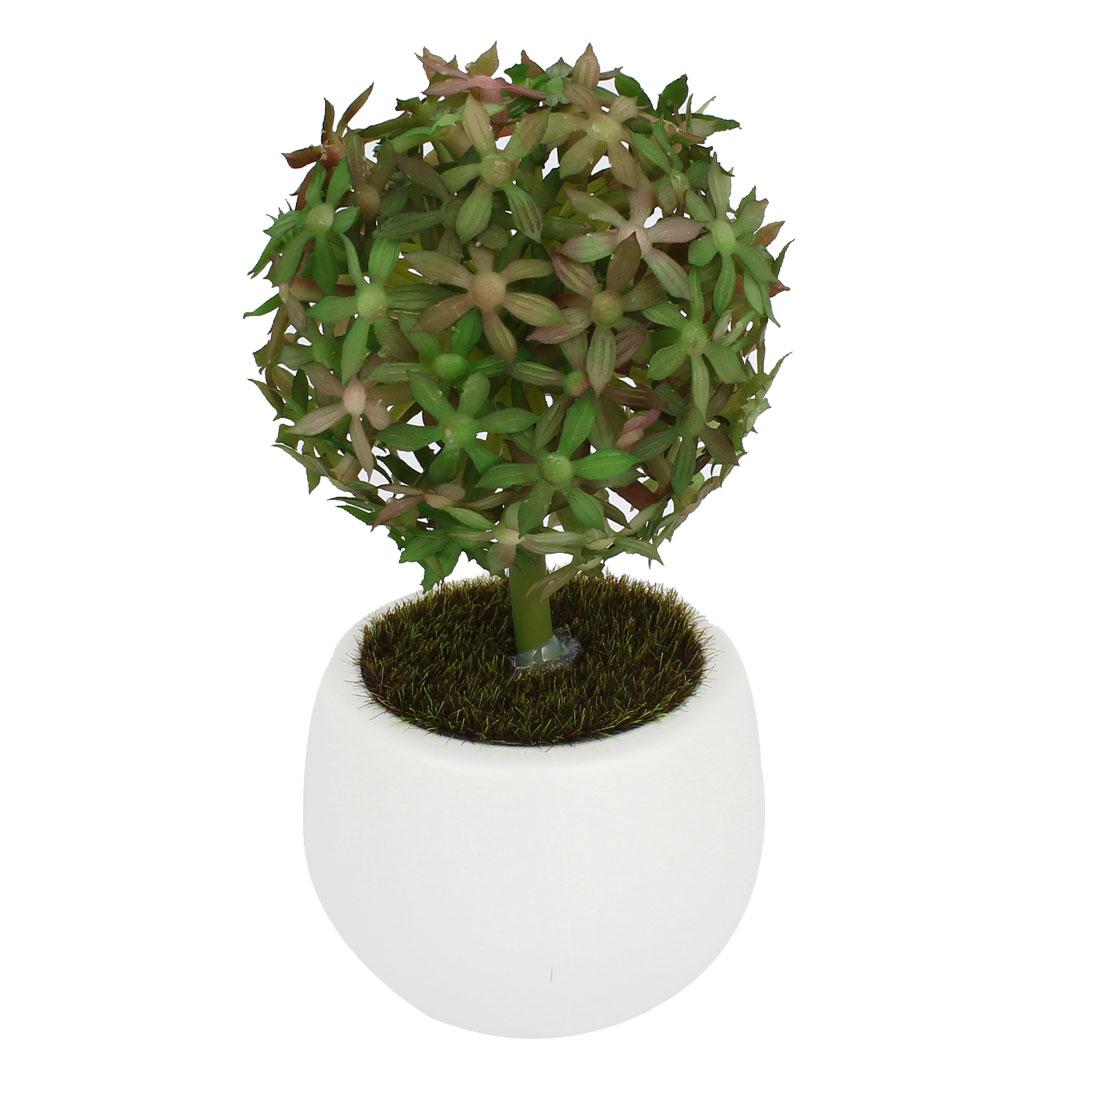 "Home Office Decoration Artificial Bonsai Plastic Floral Plant Tree 5.9"" Length"